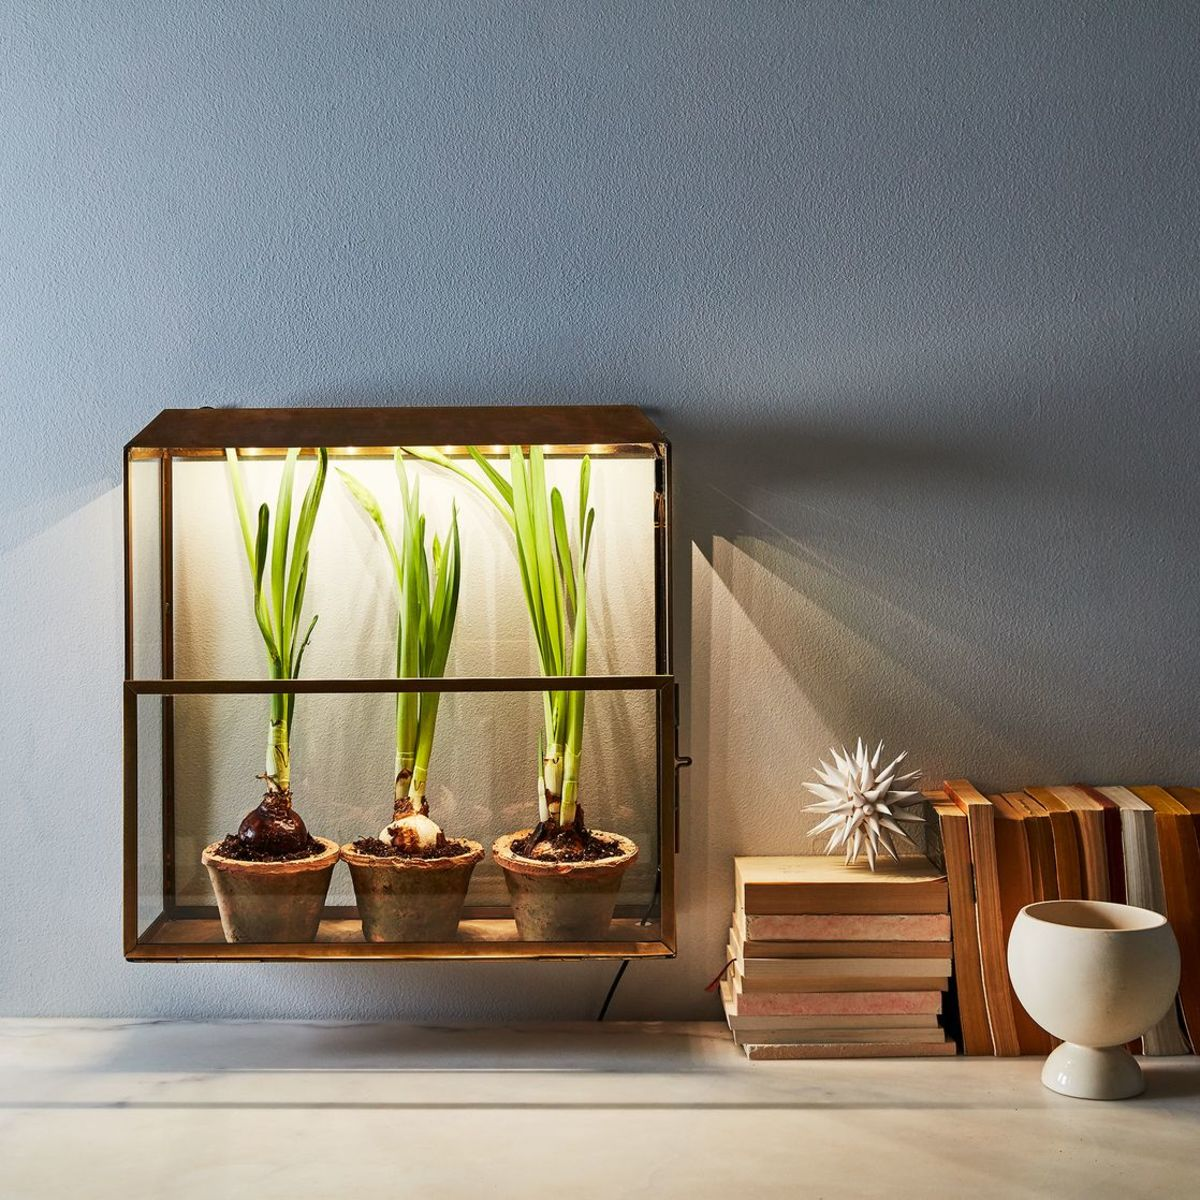 conscious foodie - grow box